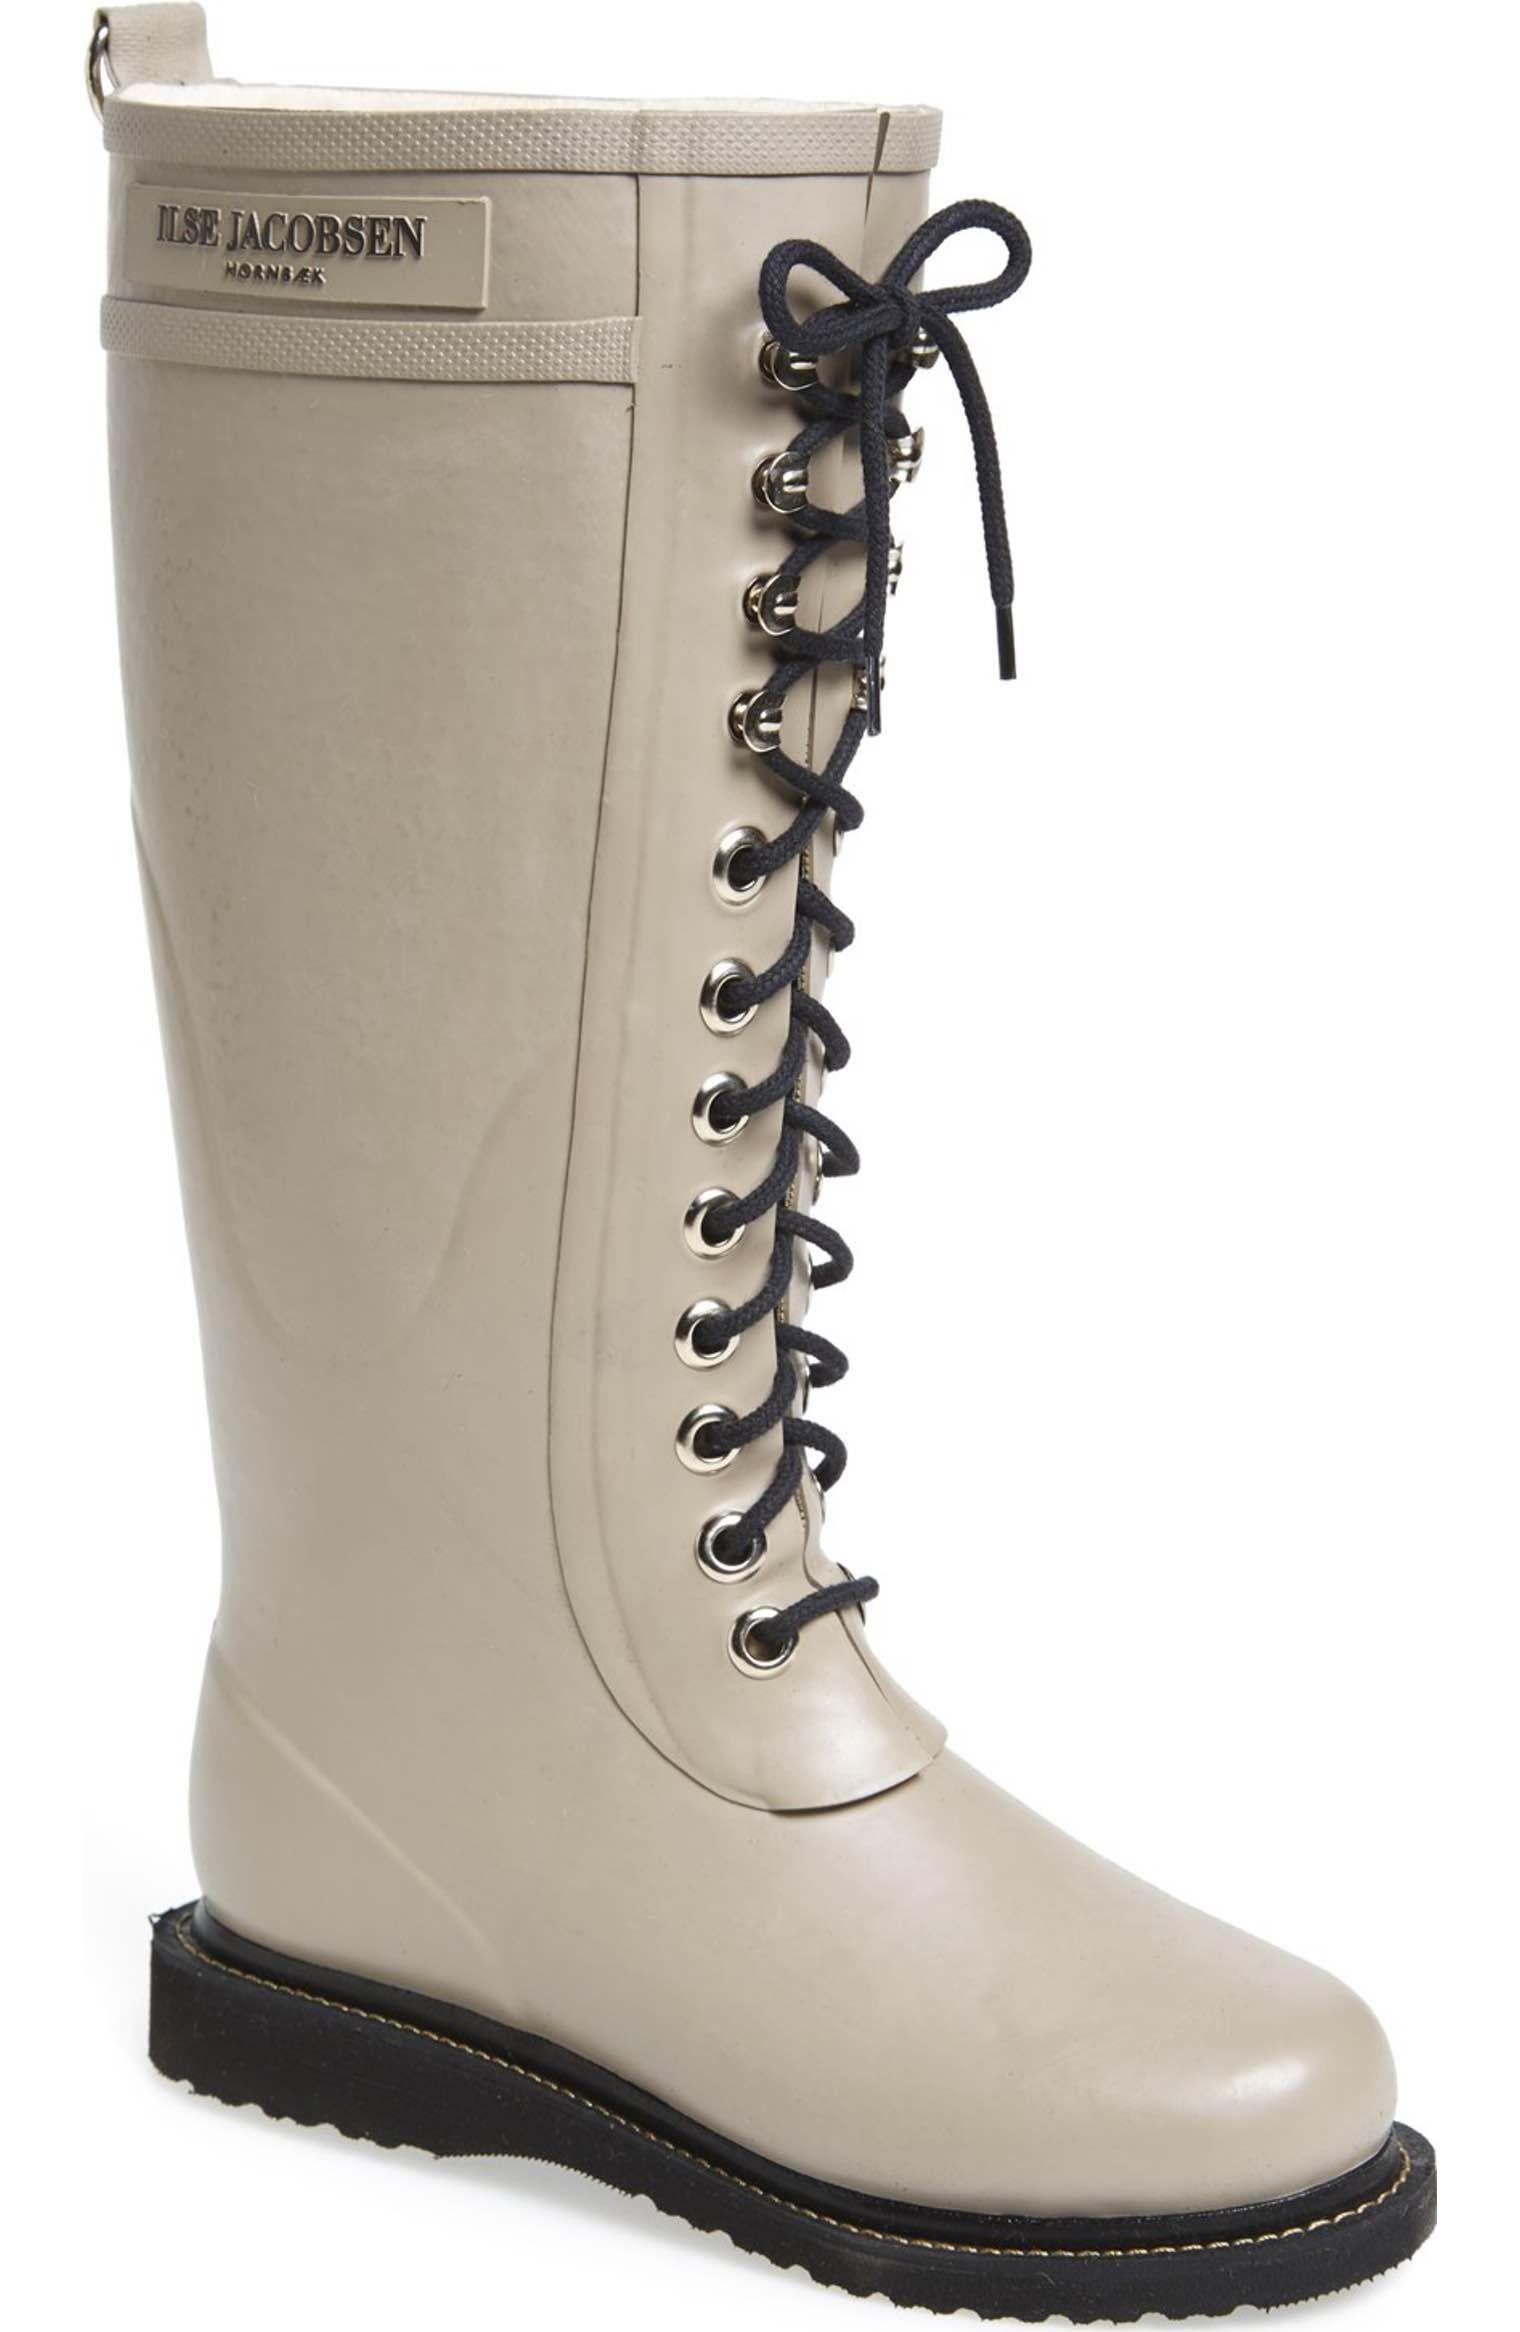 9a325c4905c4 Main Image - Ilse Jacobsen Hornbæk Rubber Boot (Women) (Wide Calf ...